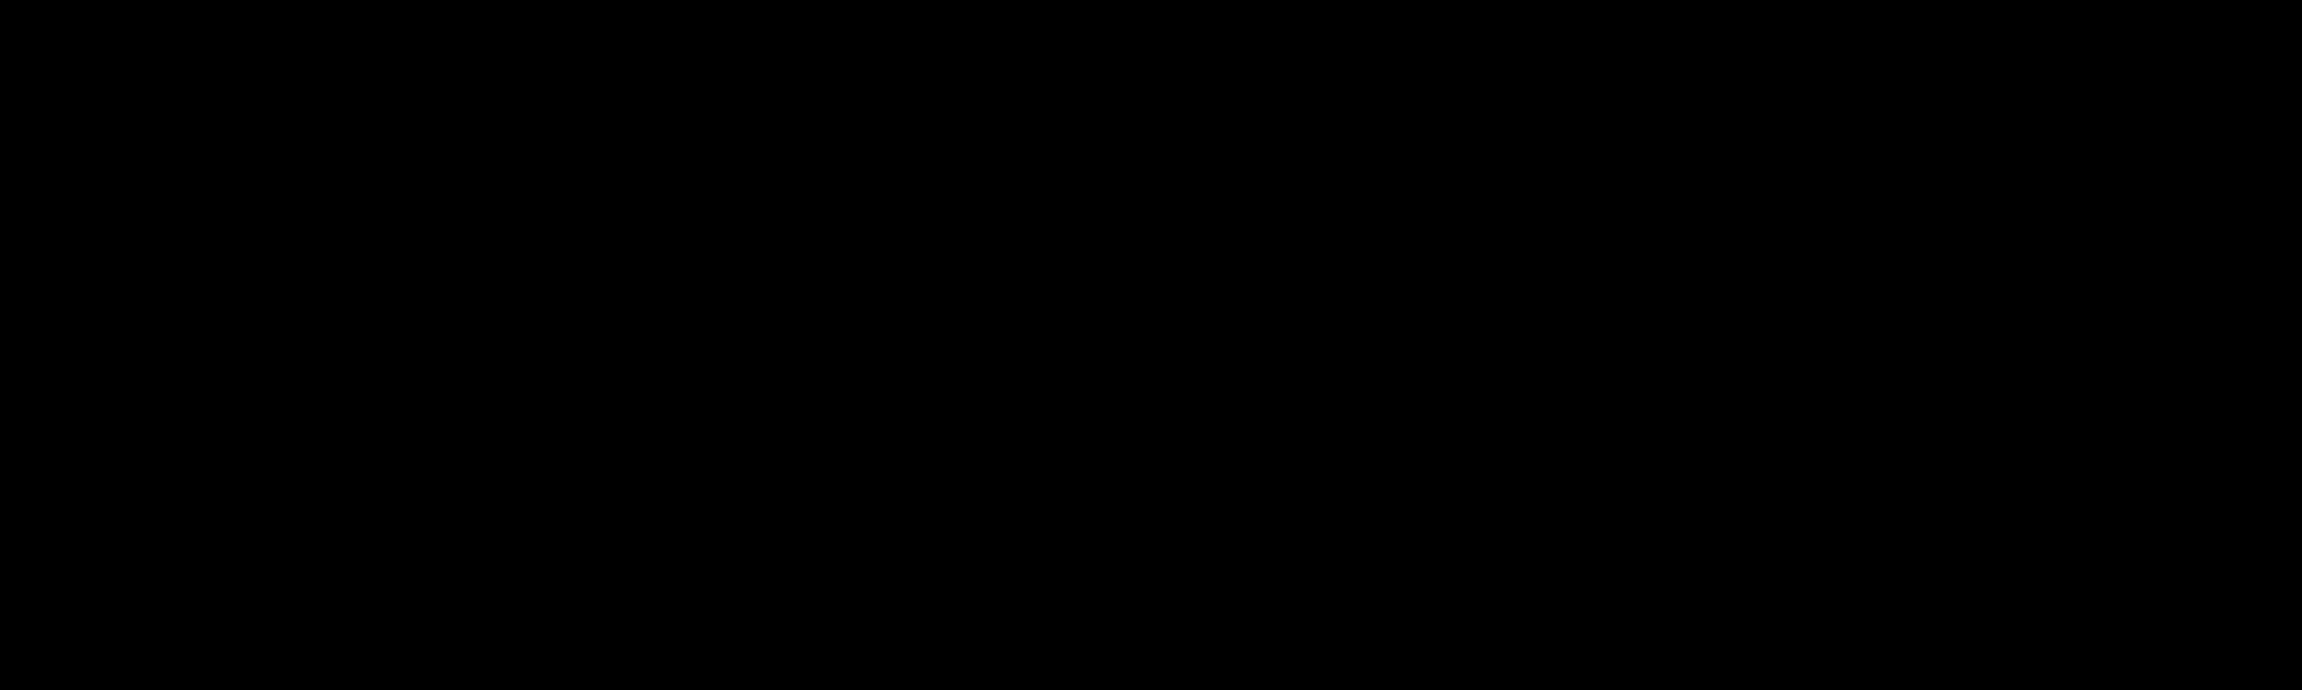 Aripiprazole-d<sub>8</sub> EP impurity D (butyl-d<sub>8</sub>)